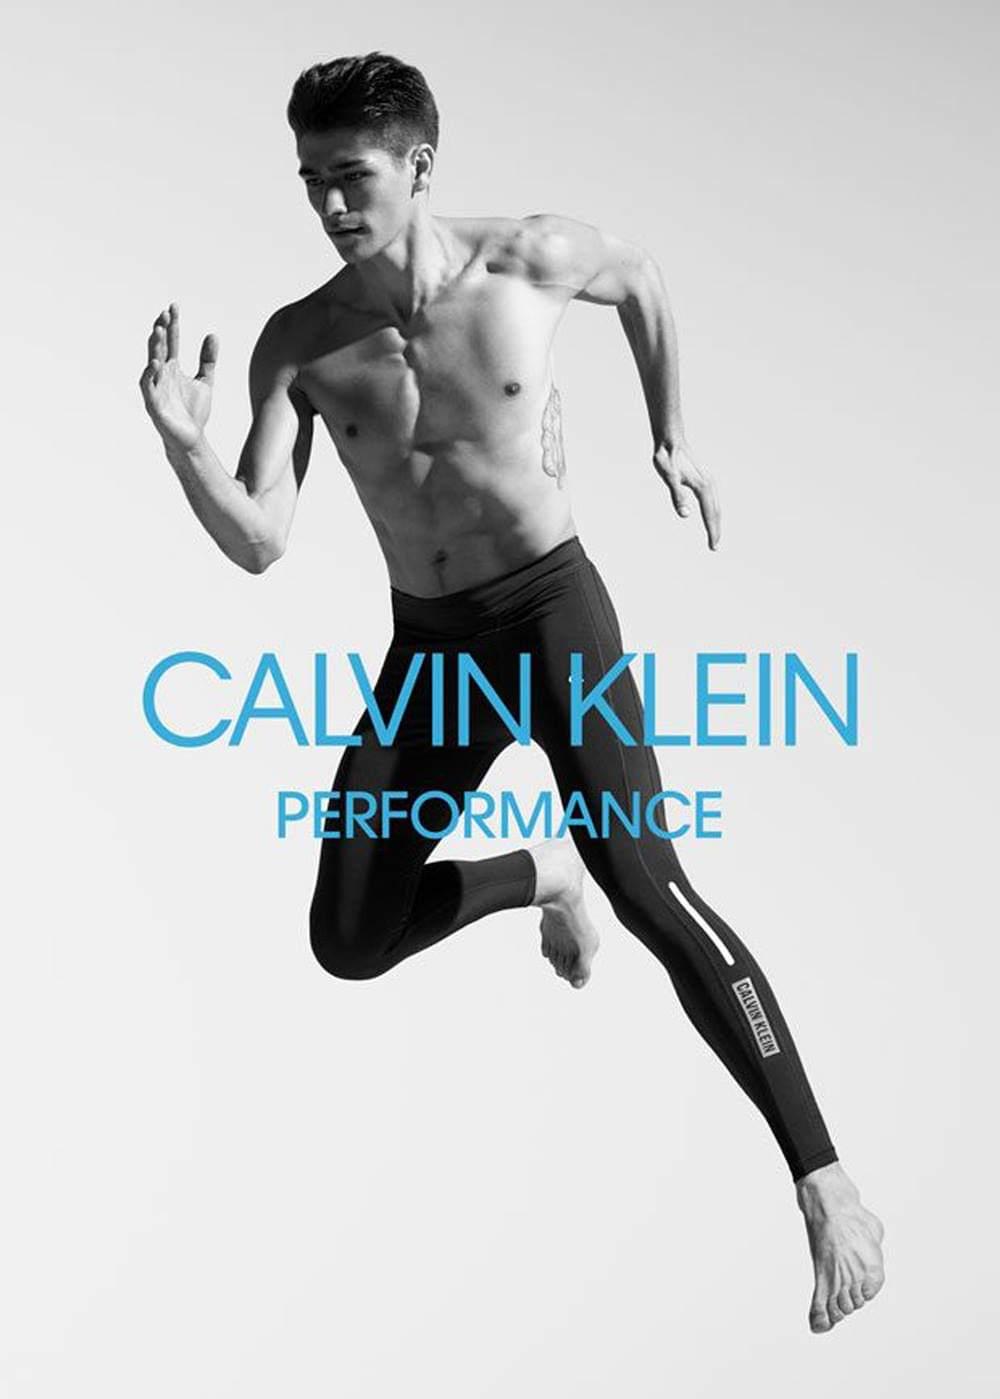 CK Performance campaign